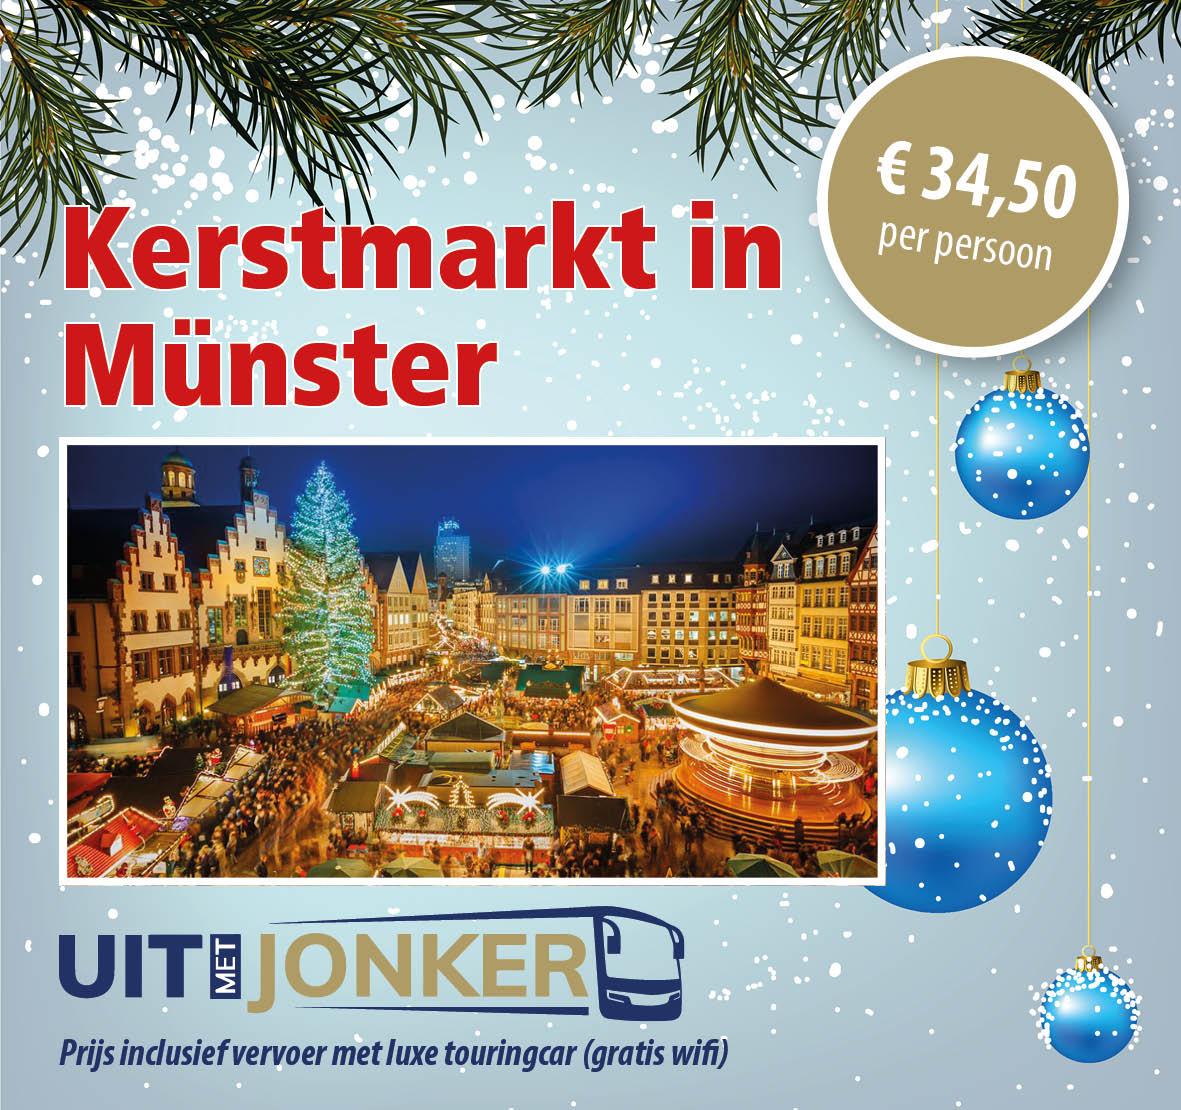 Dagtocht kerstmarkt Munster